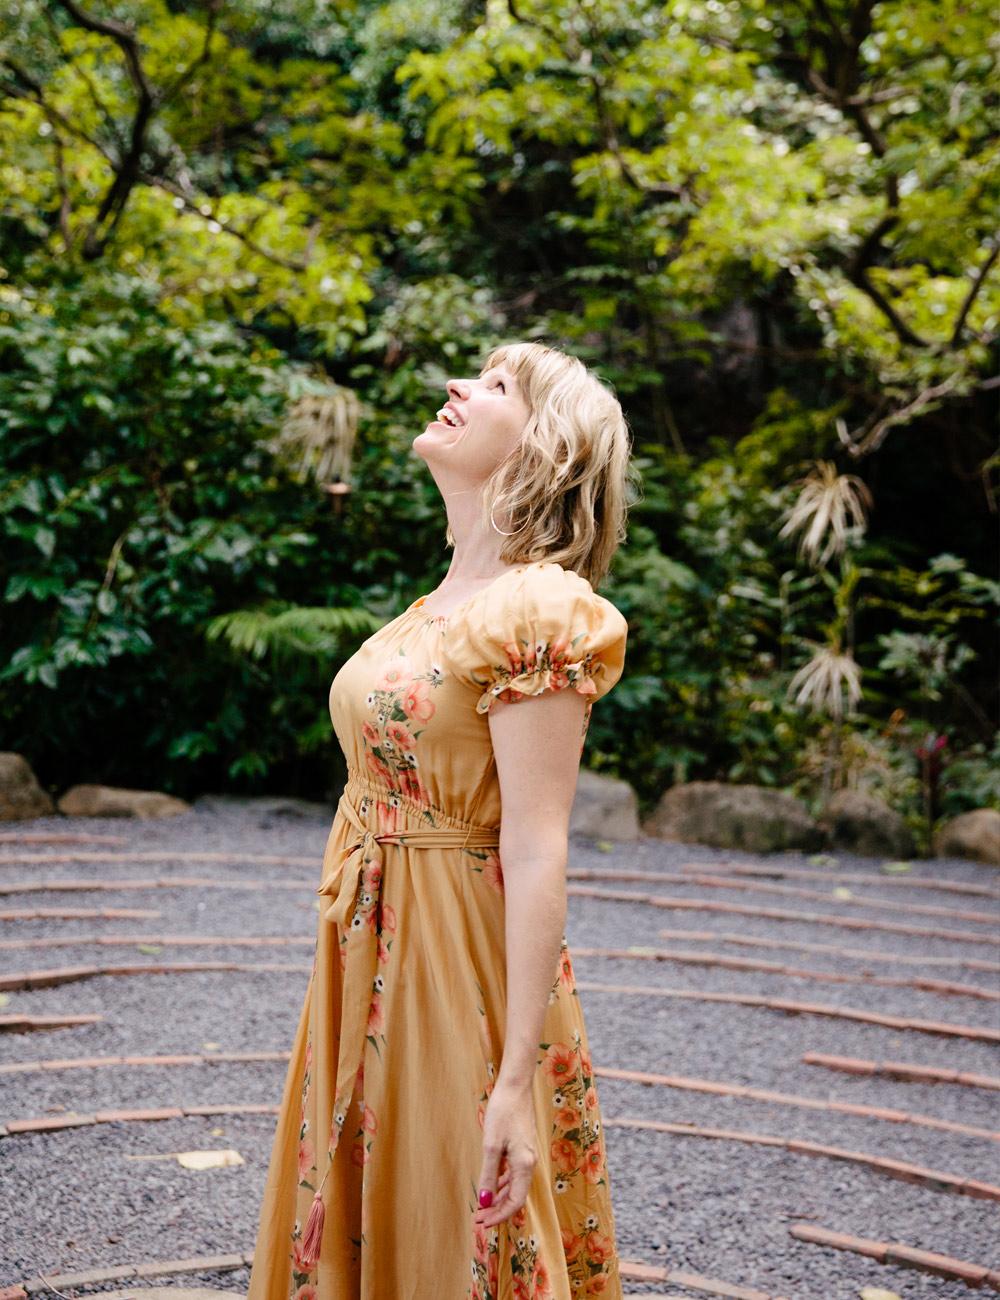 Mandy Roberts Yoga